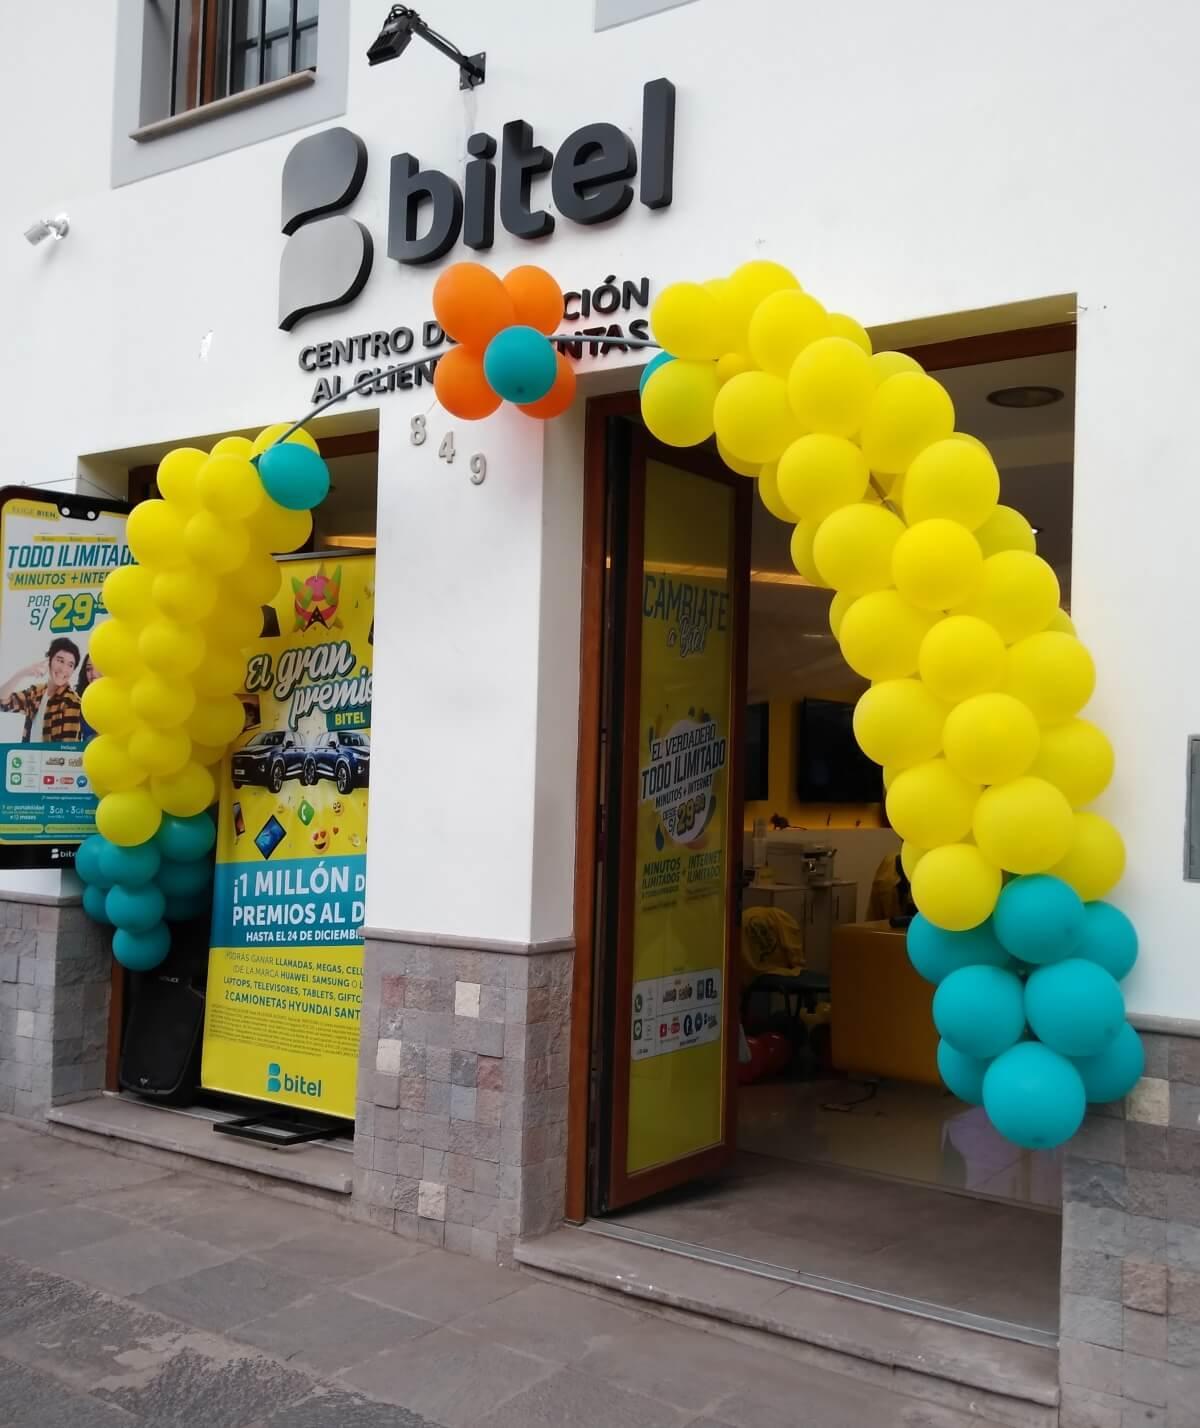 Bitel store in Avenida El Sol